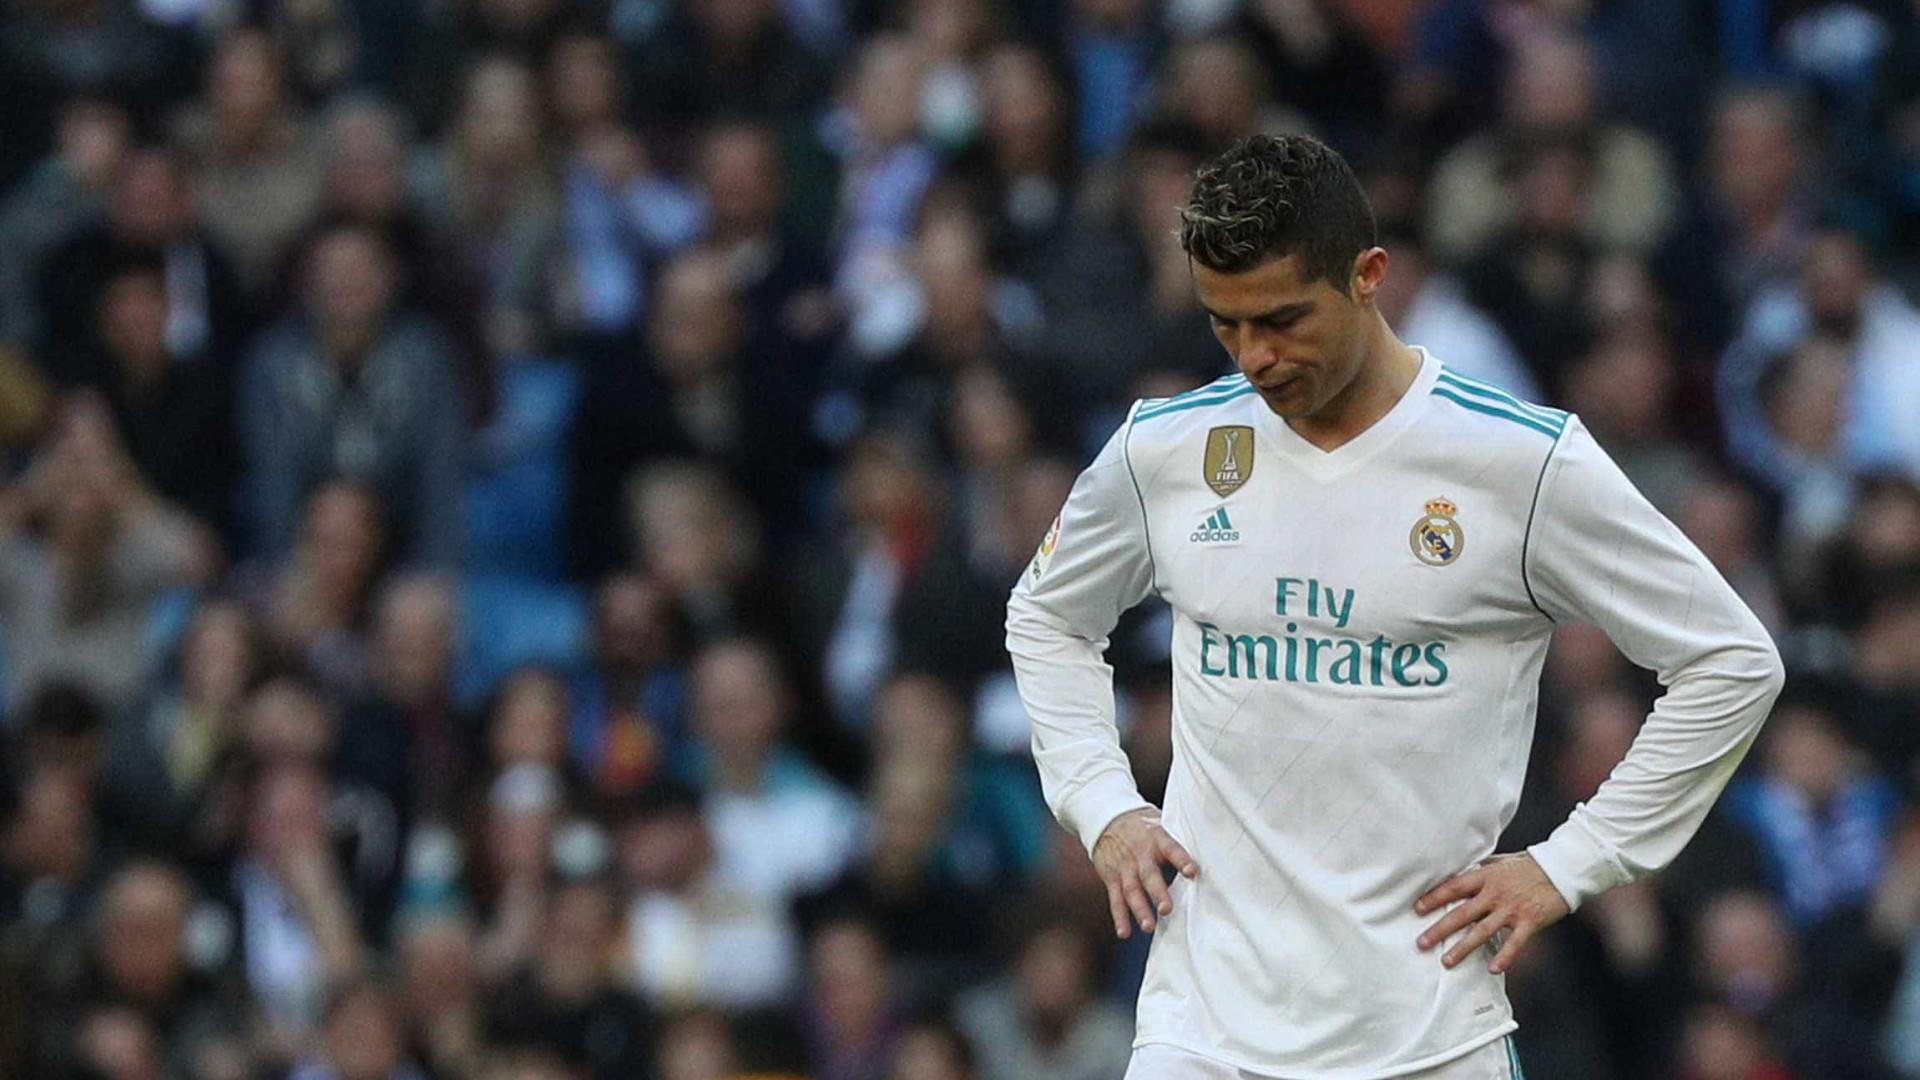 Neymar aceita diminuir salário para vestir camisa do Real Madrid, diz jornal